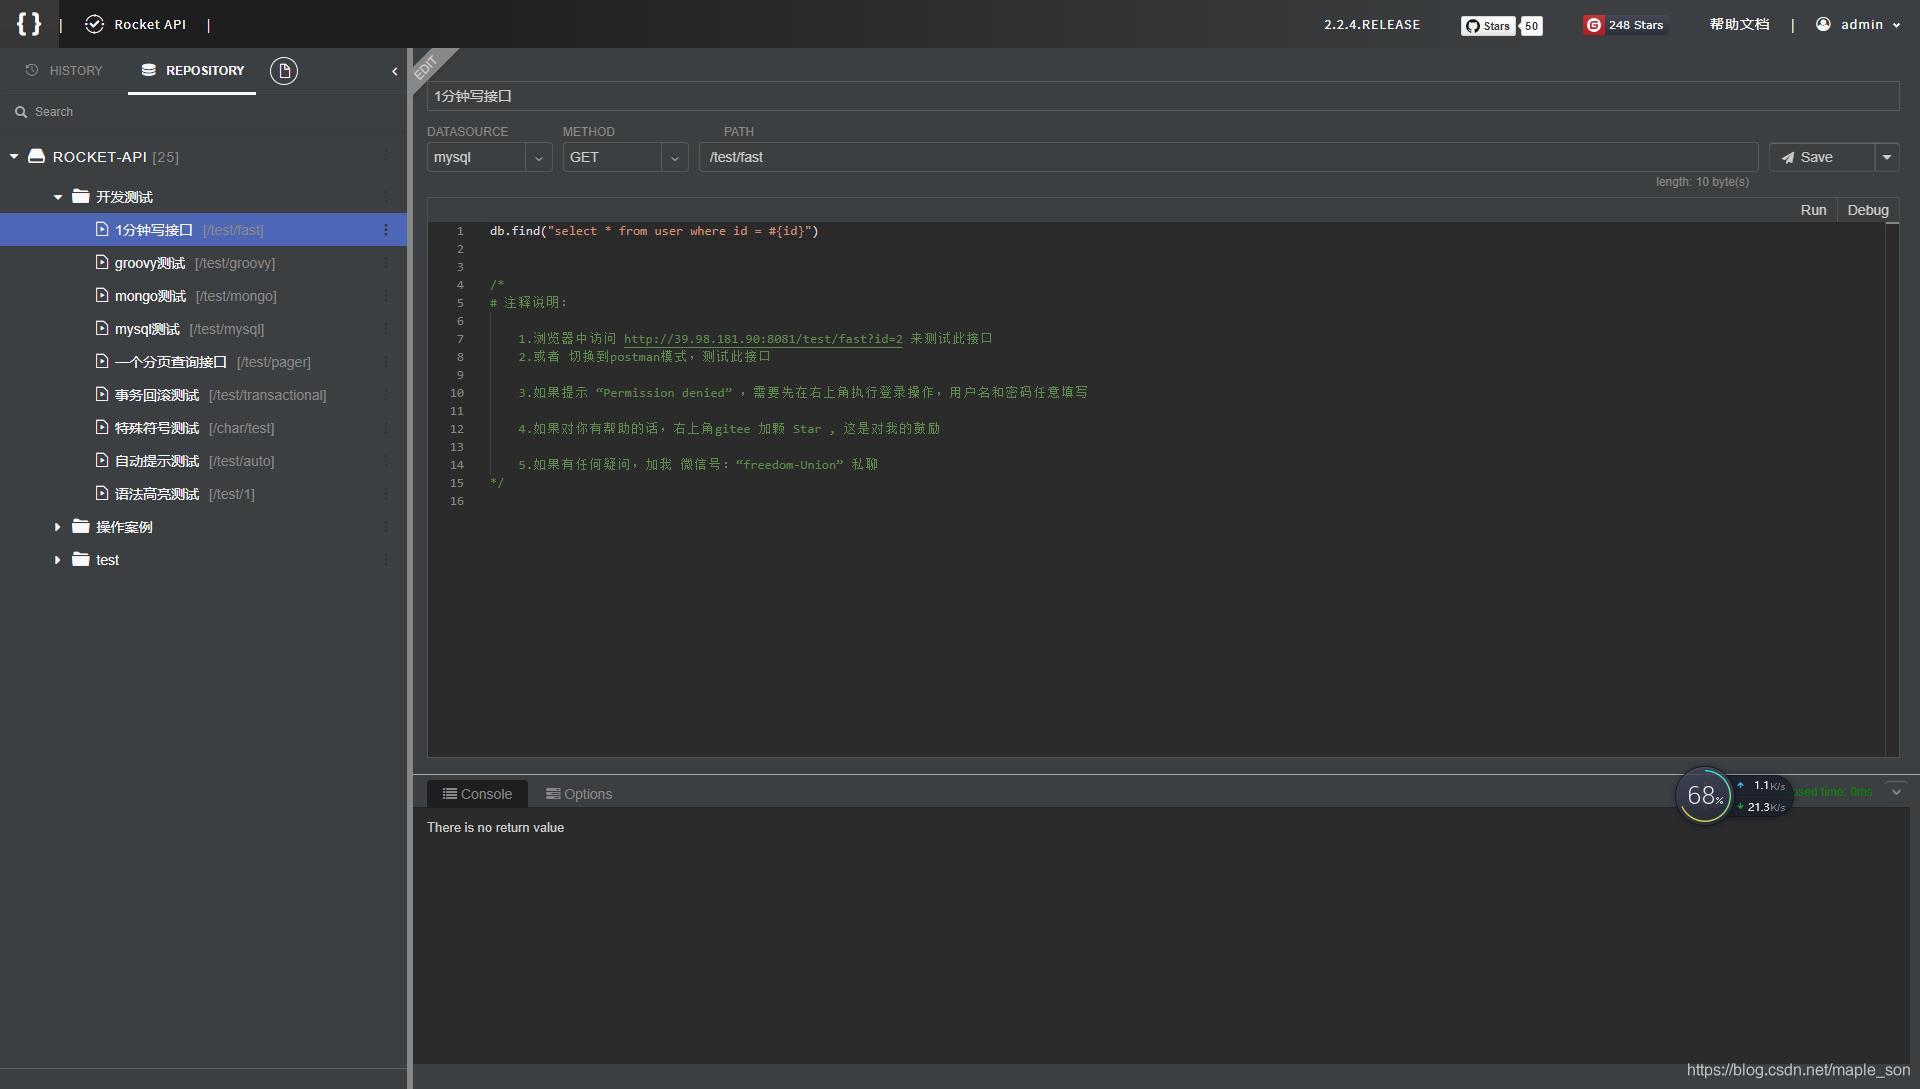 Rocket-API 的前世今生